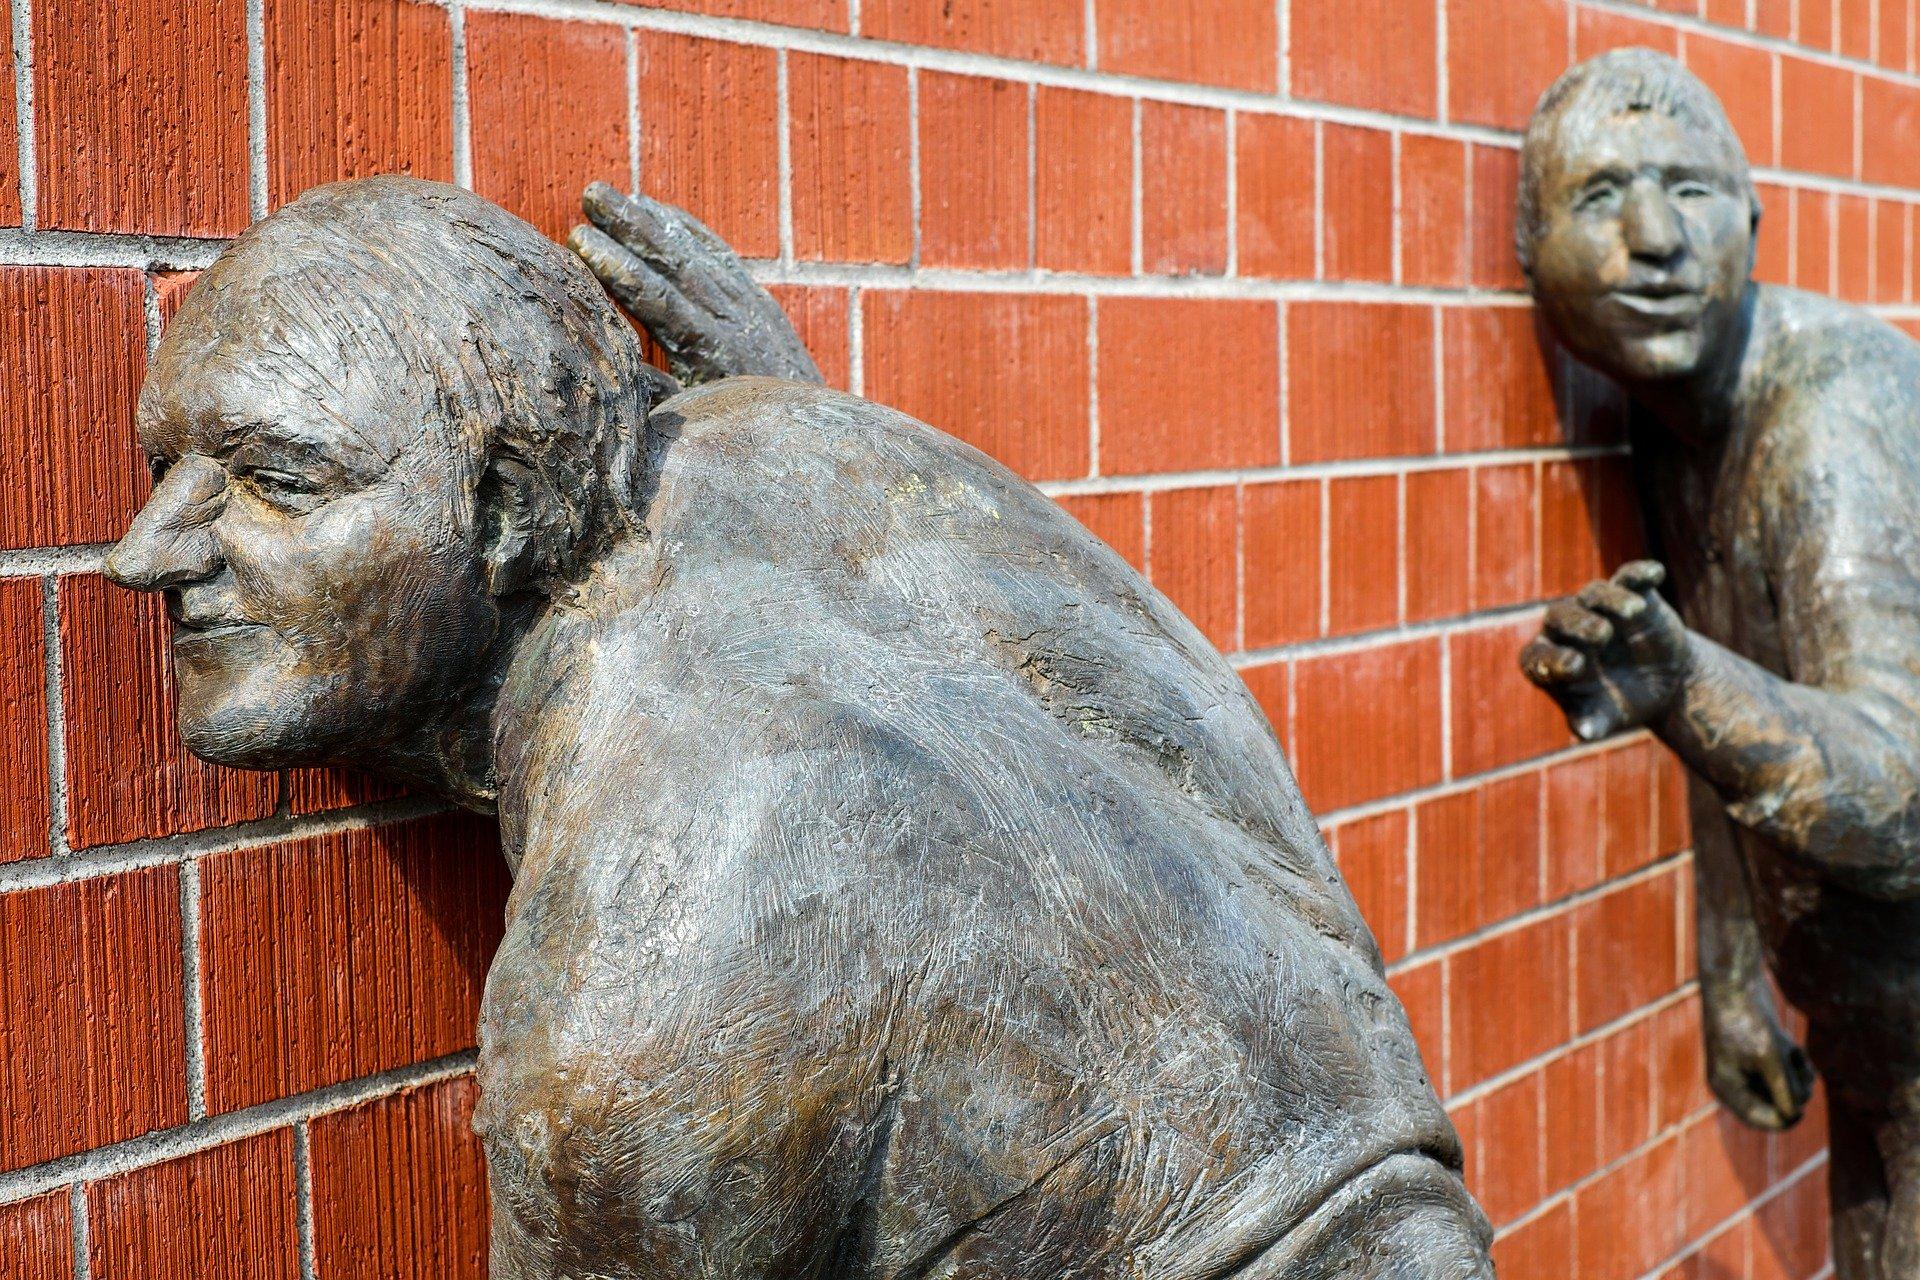 sculpture-2209152_1920